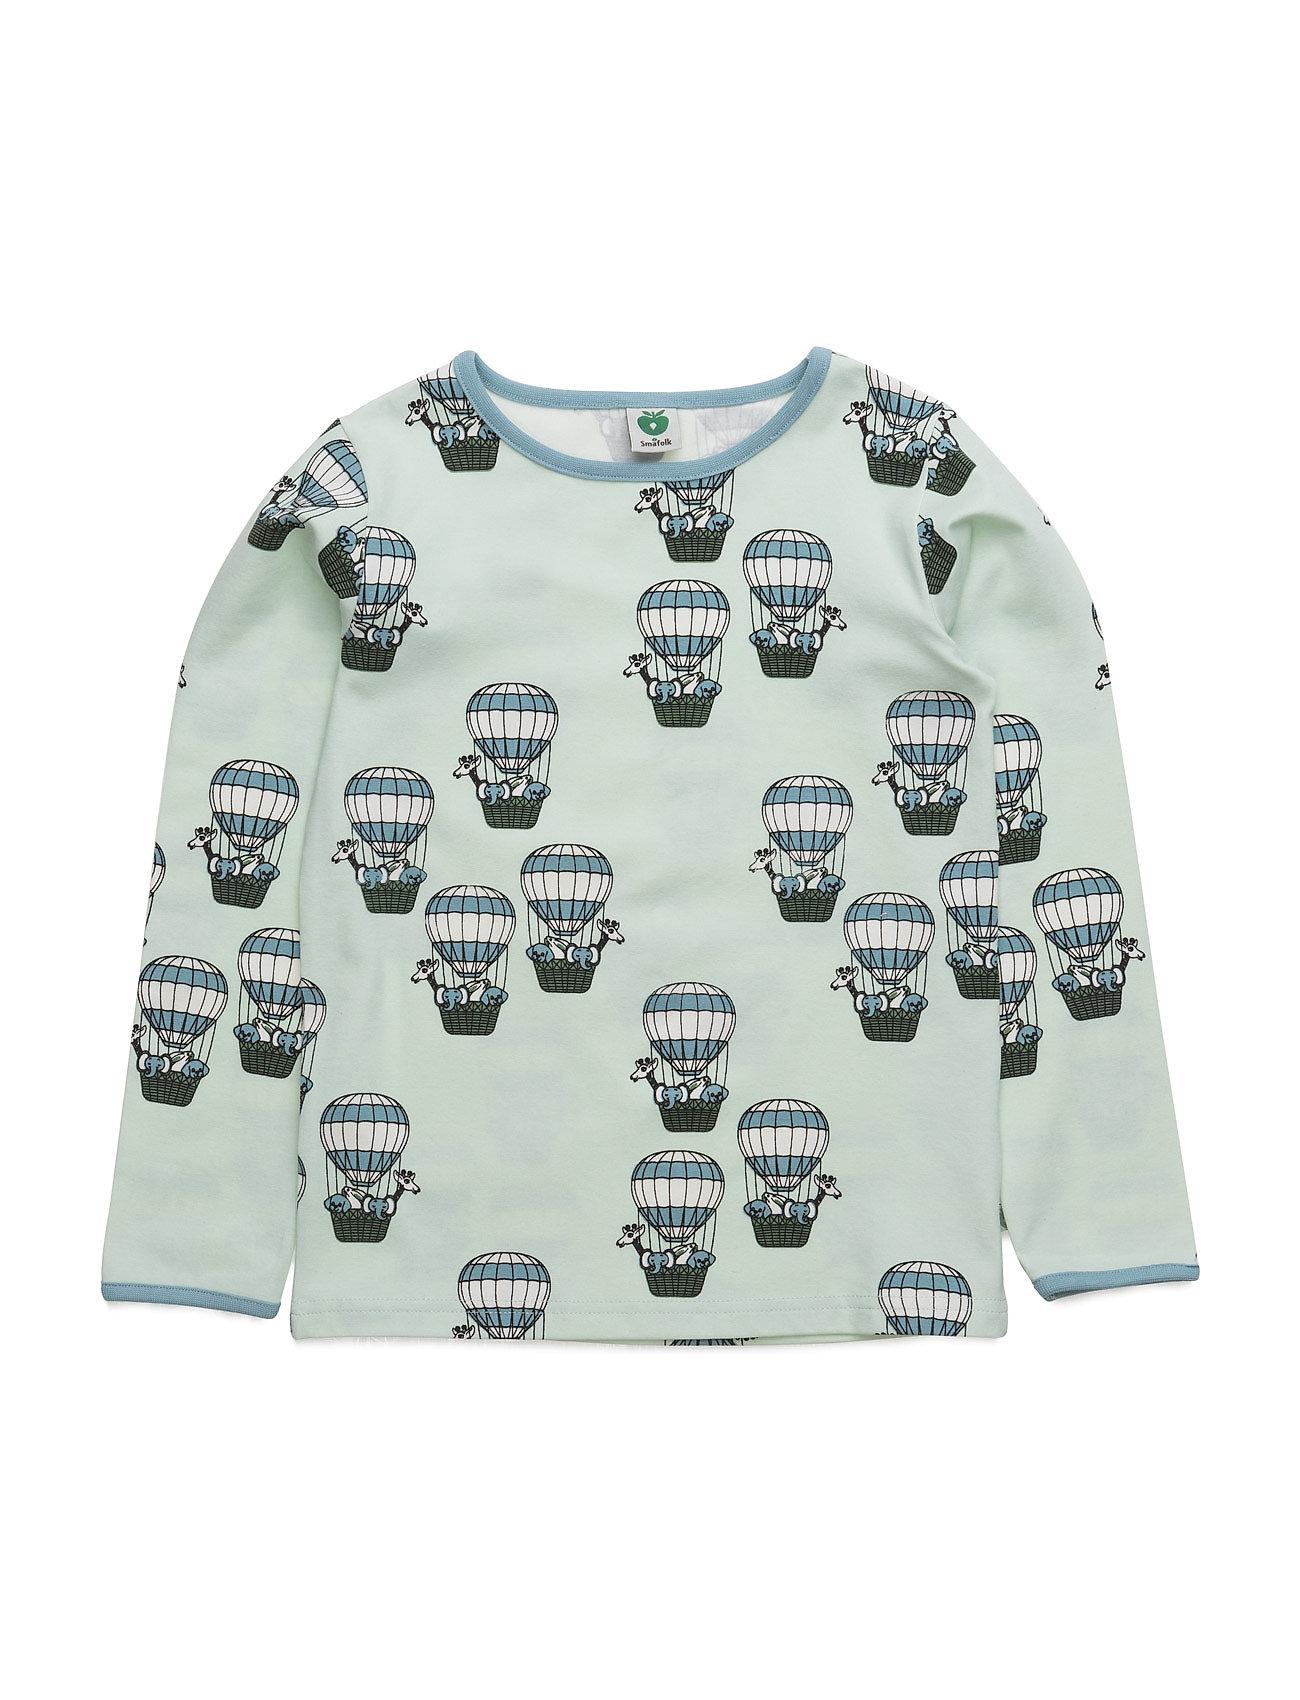 T Shirt Ls. Hotairballoon Småfolk Langærmede t shirts til Børn i